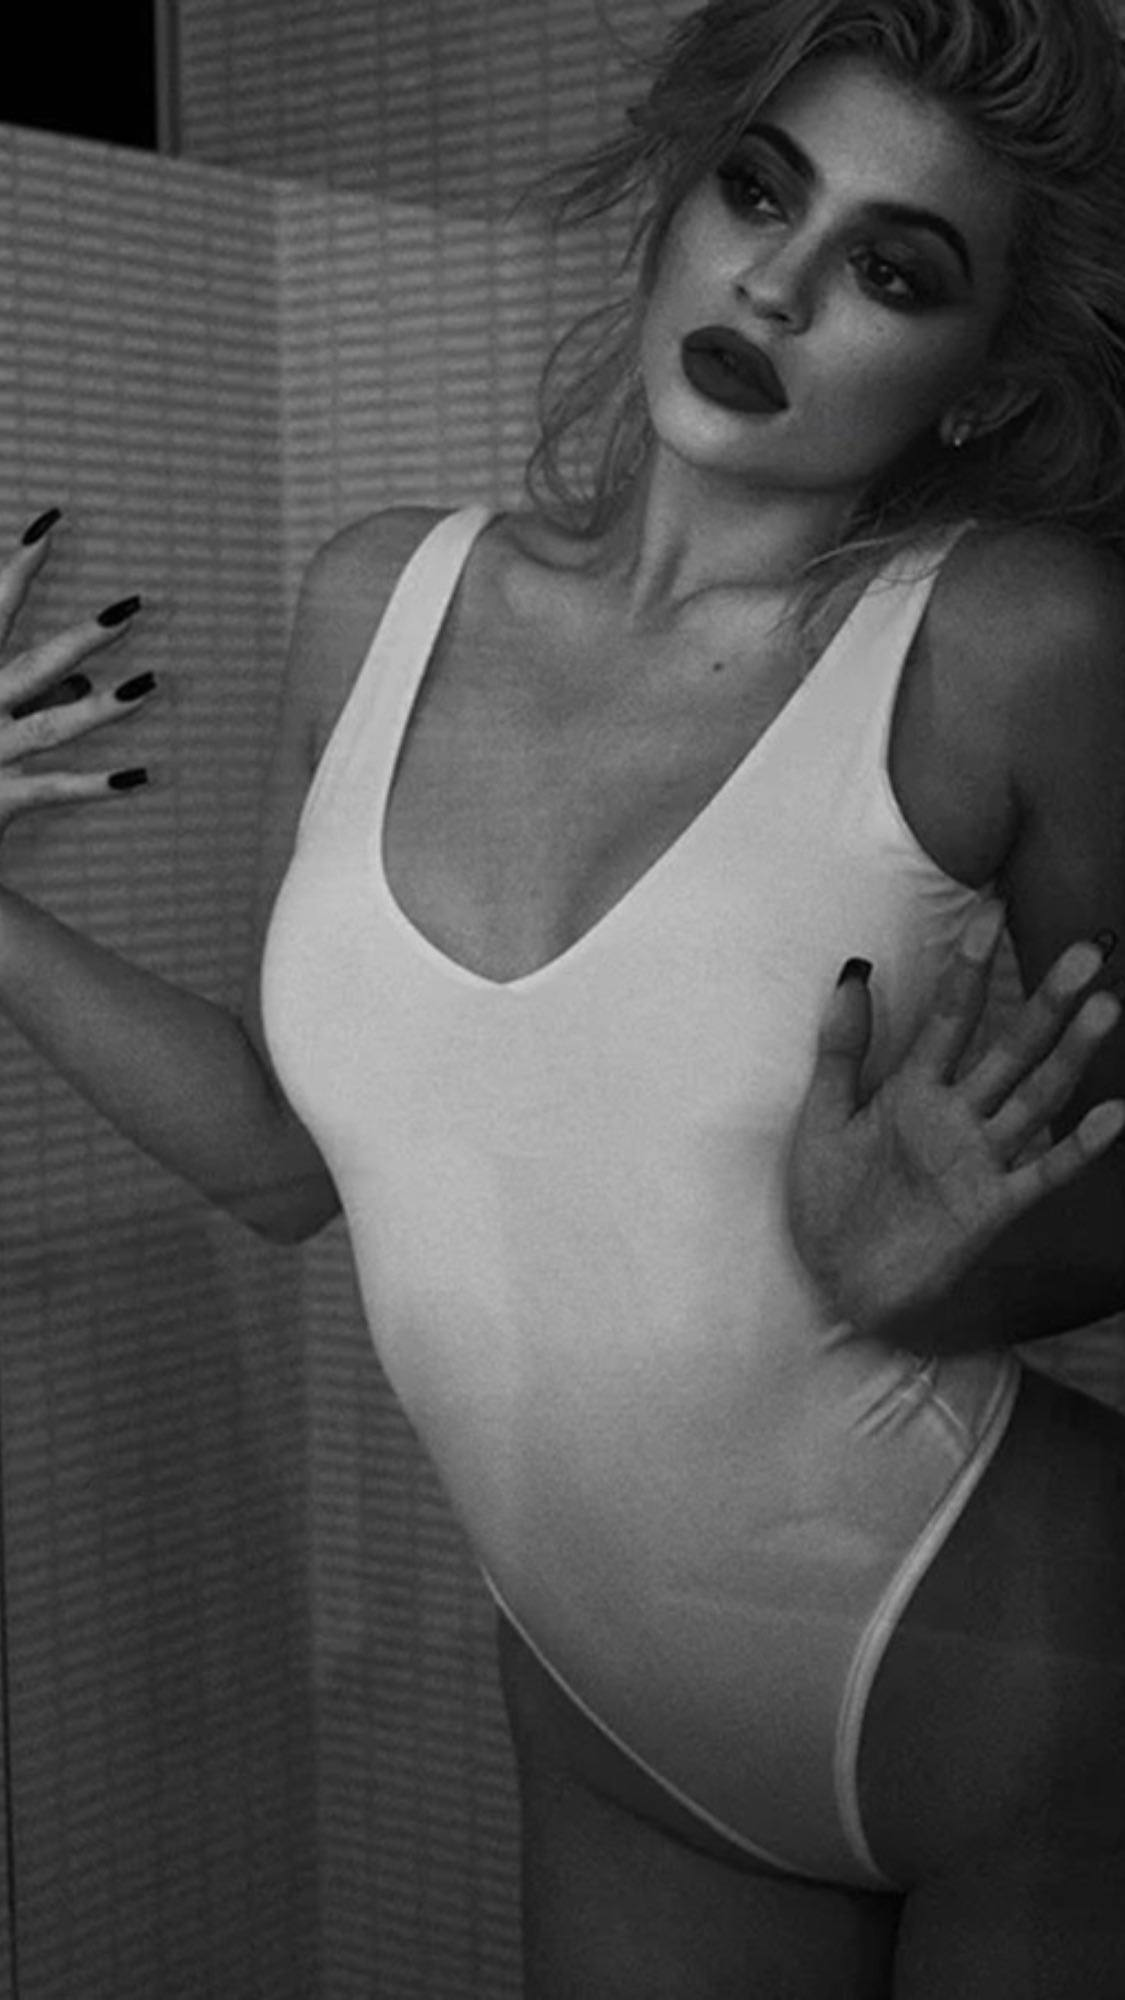 Kylie Jenner White Swimsuit